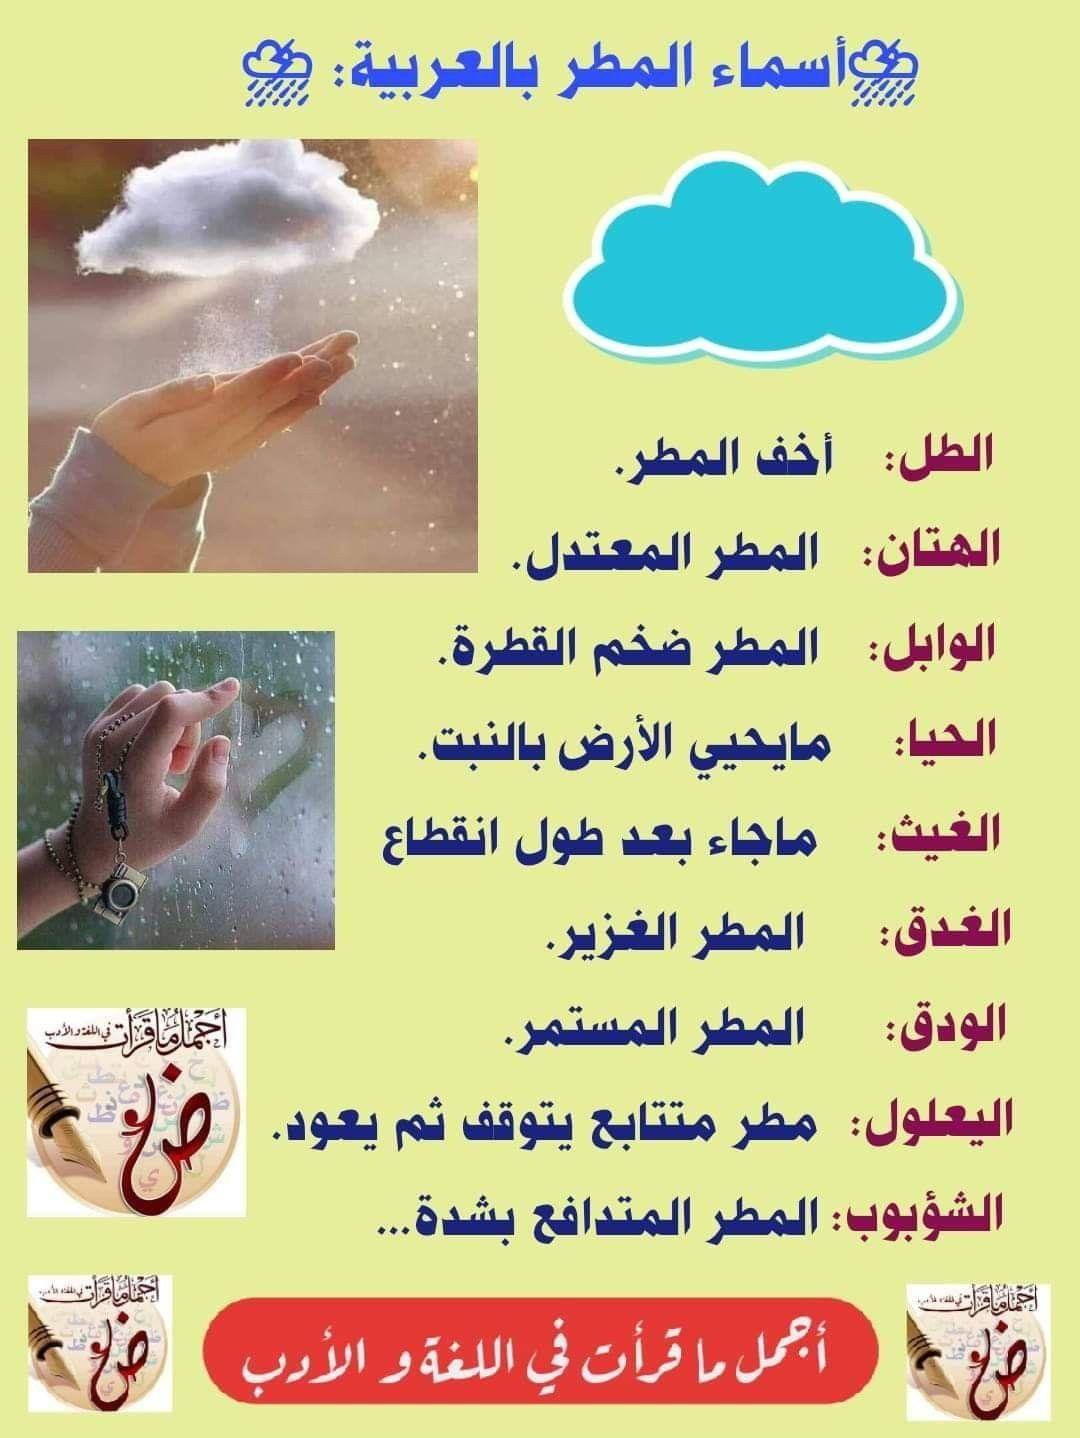 Pin By Celil Yagmuroglu On دعاء Learning Arabic Learn Arabic Language Arabic Langauge